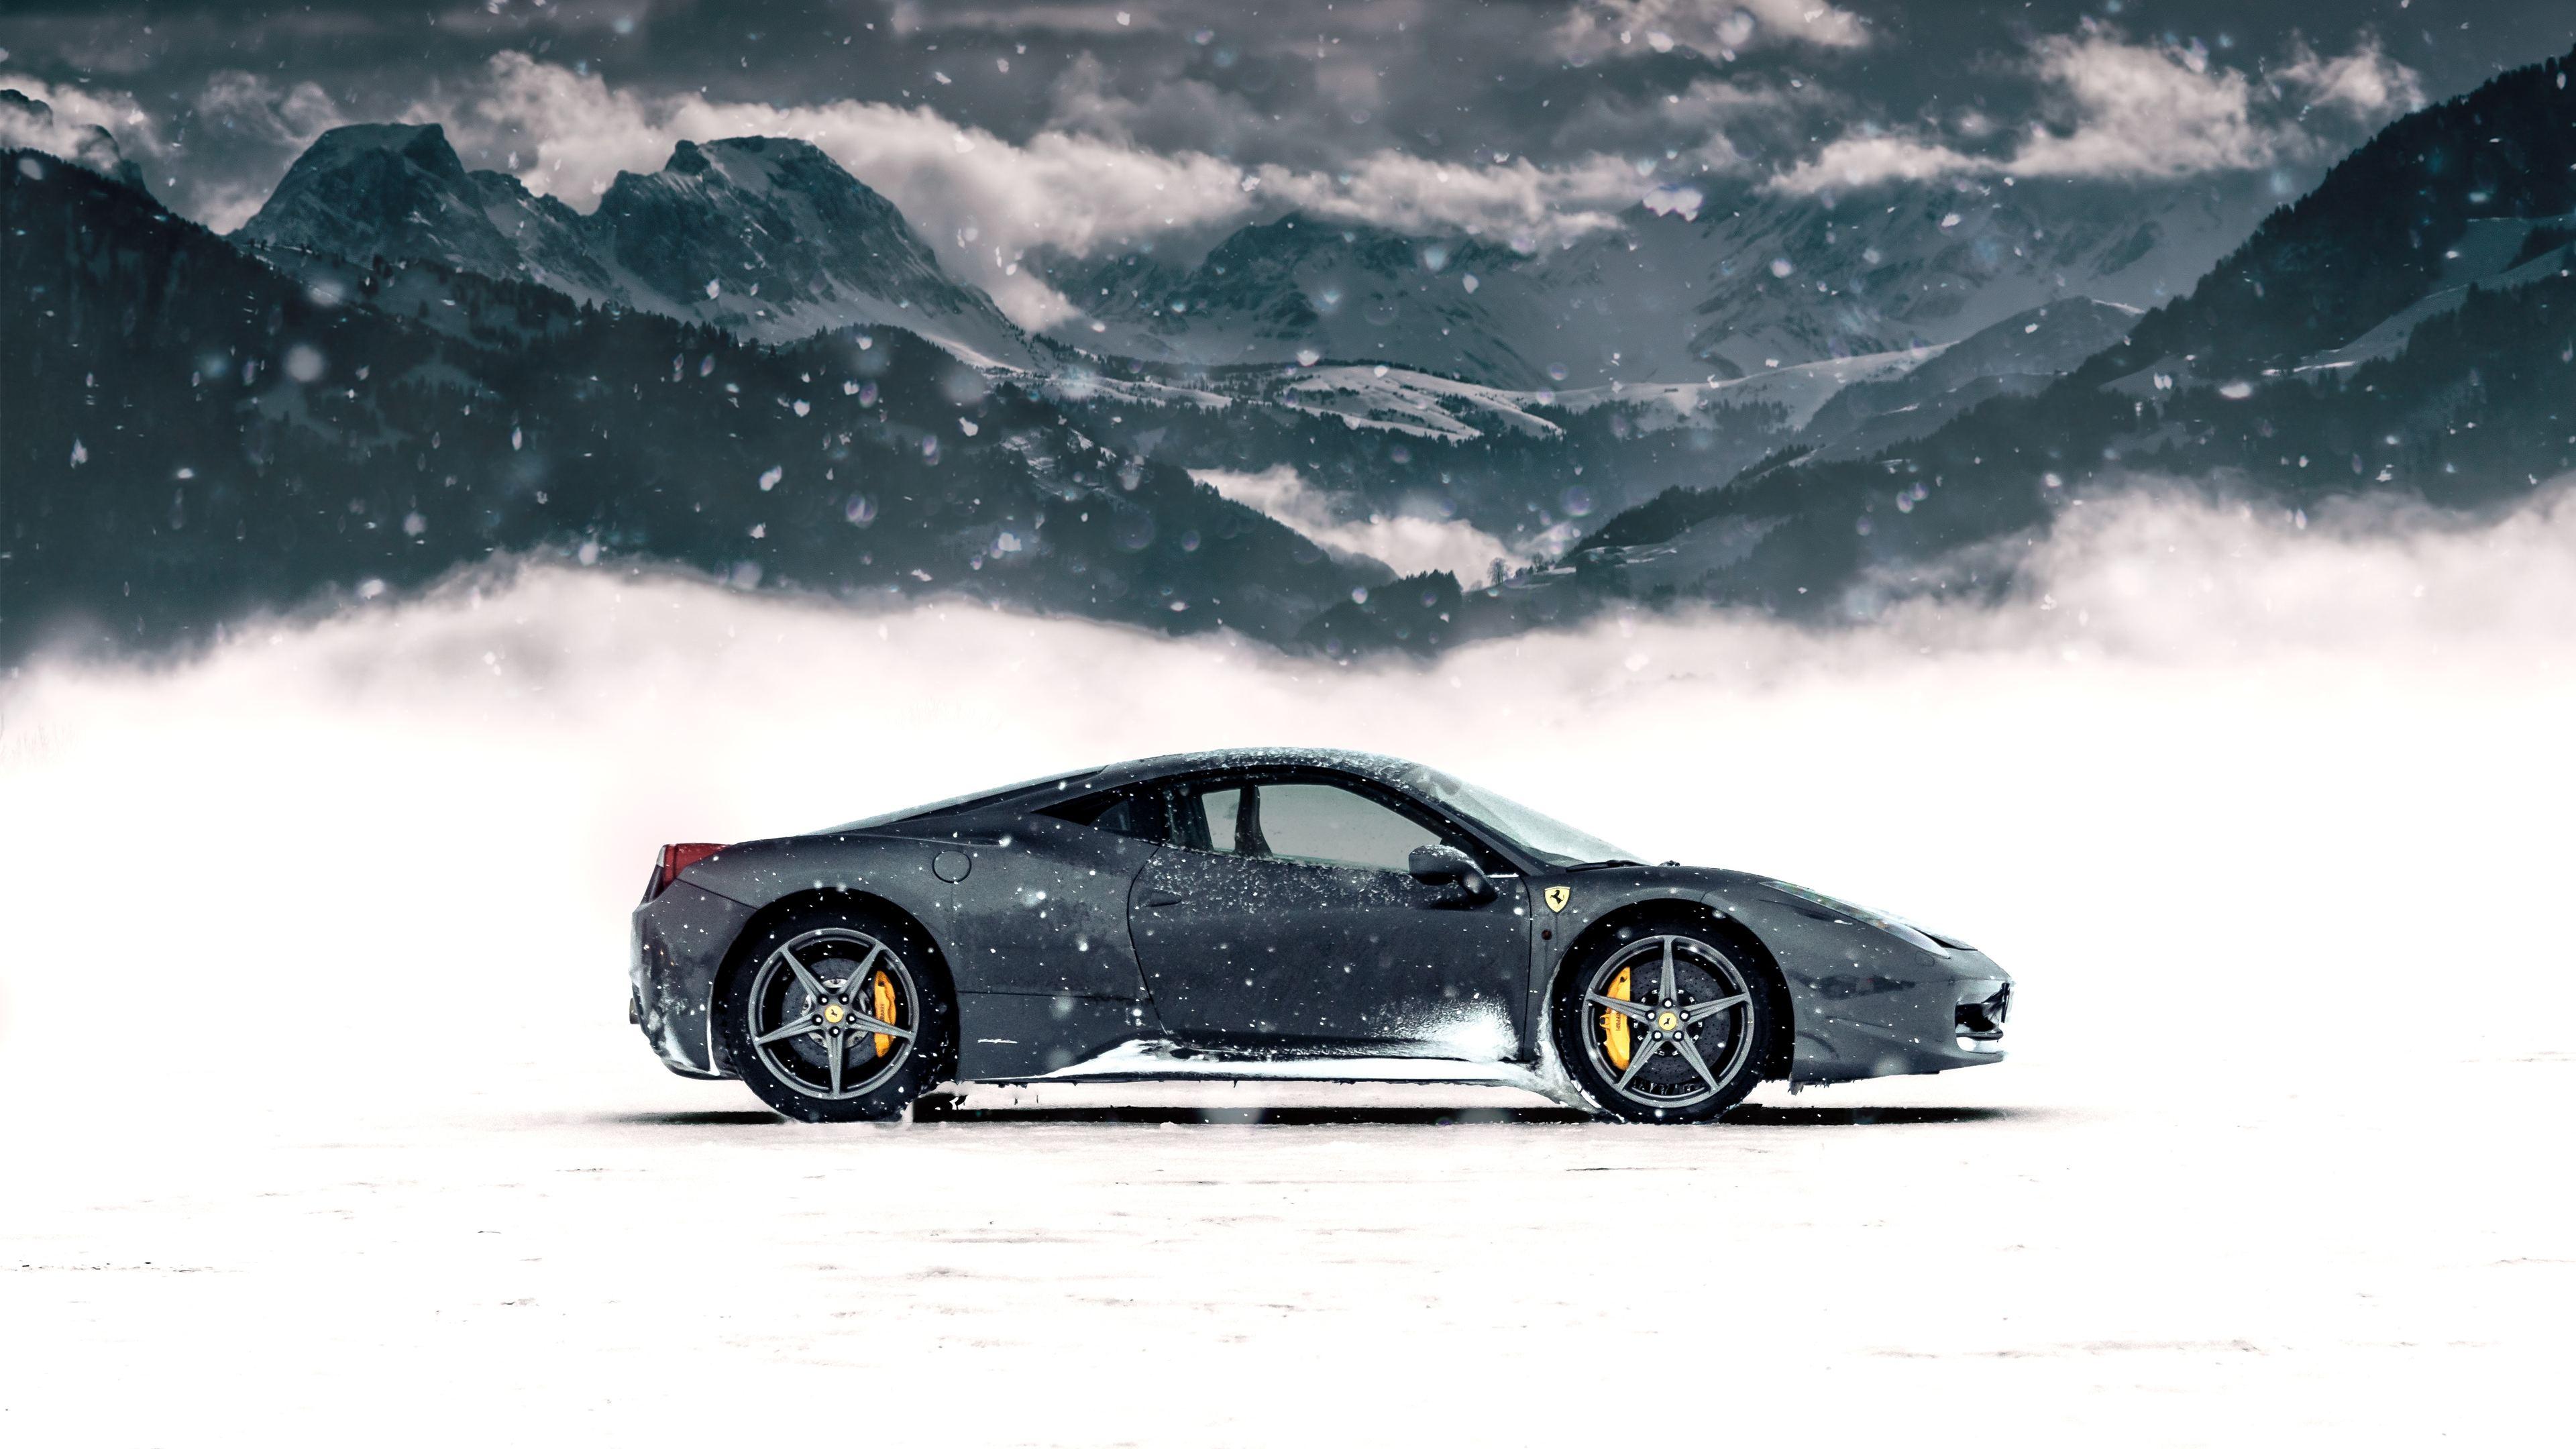 ferrari in snow 4k 1556185150 - Ferrari In Snow 4k - snow wallpapers, nature wallpapers, hd-wallpapers, ferrari wallpapers, 5k wallpapers, 4k-wallpapers